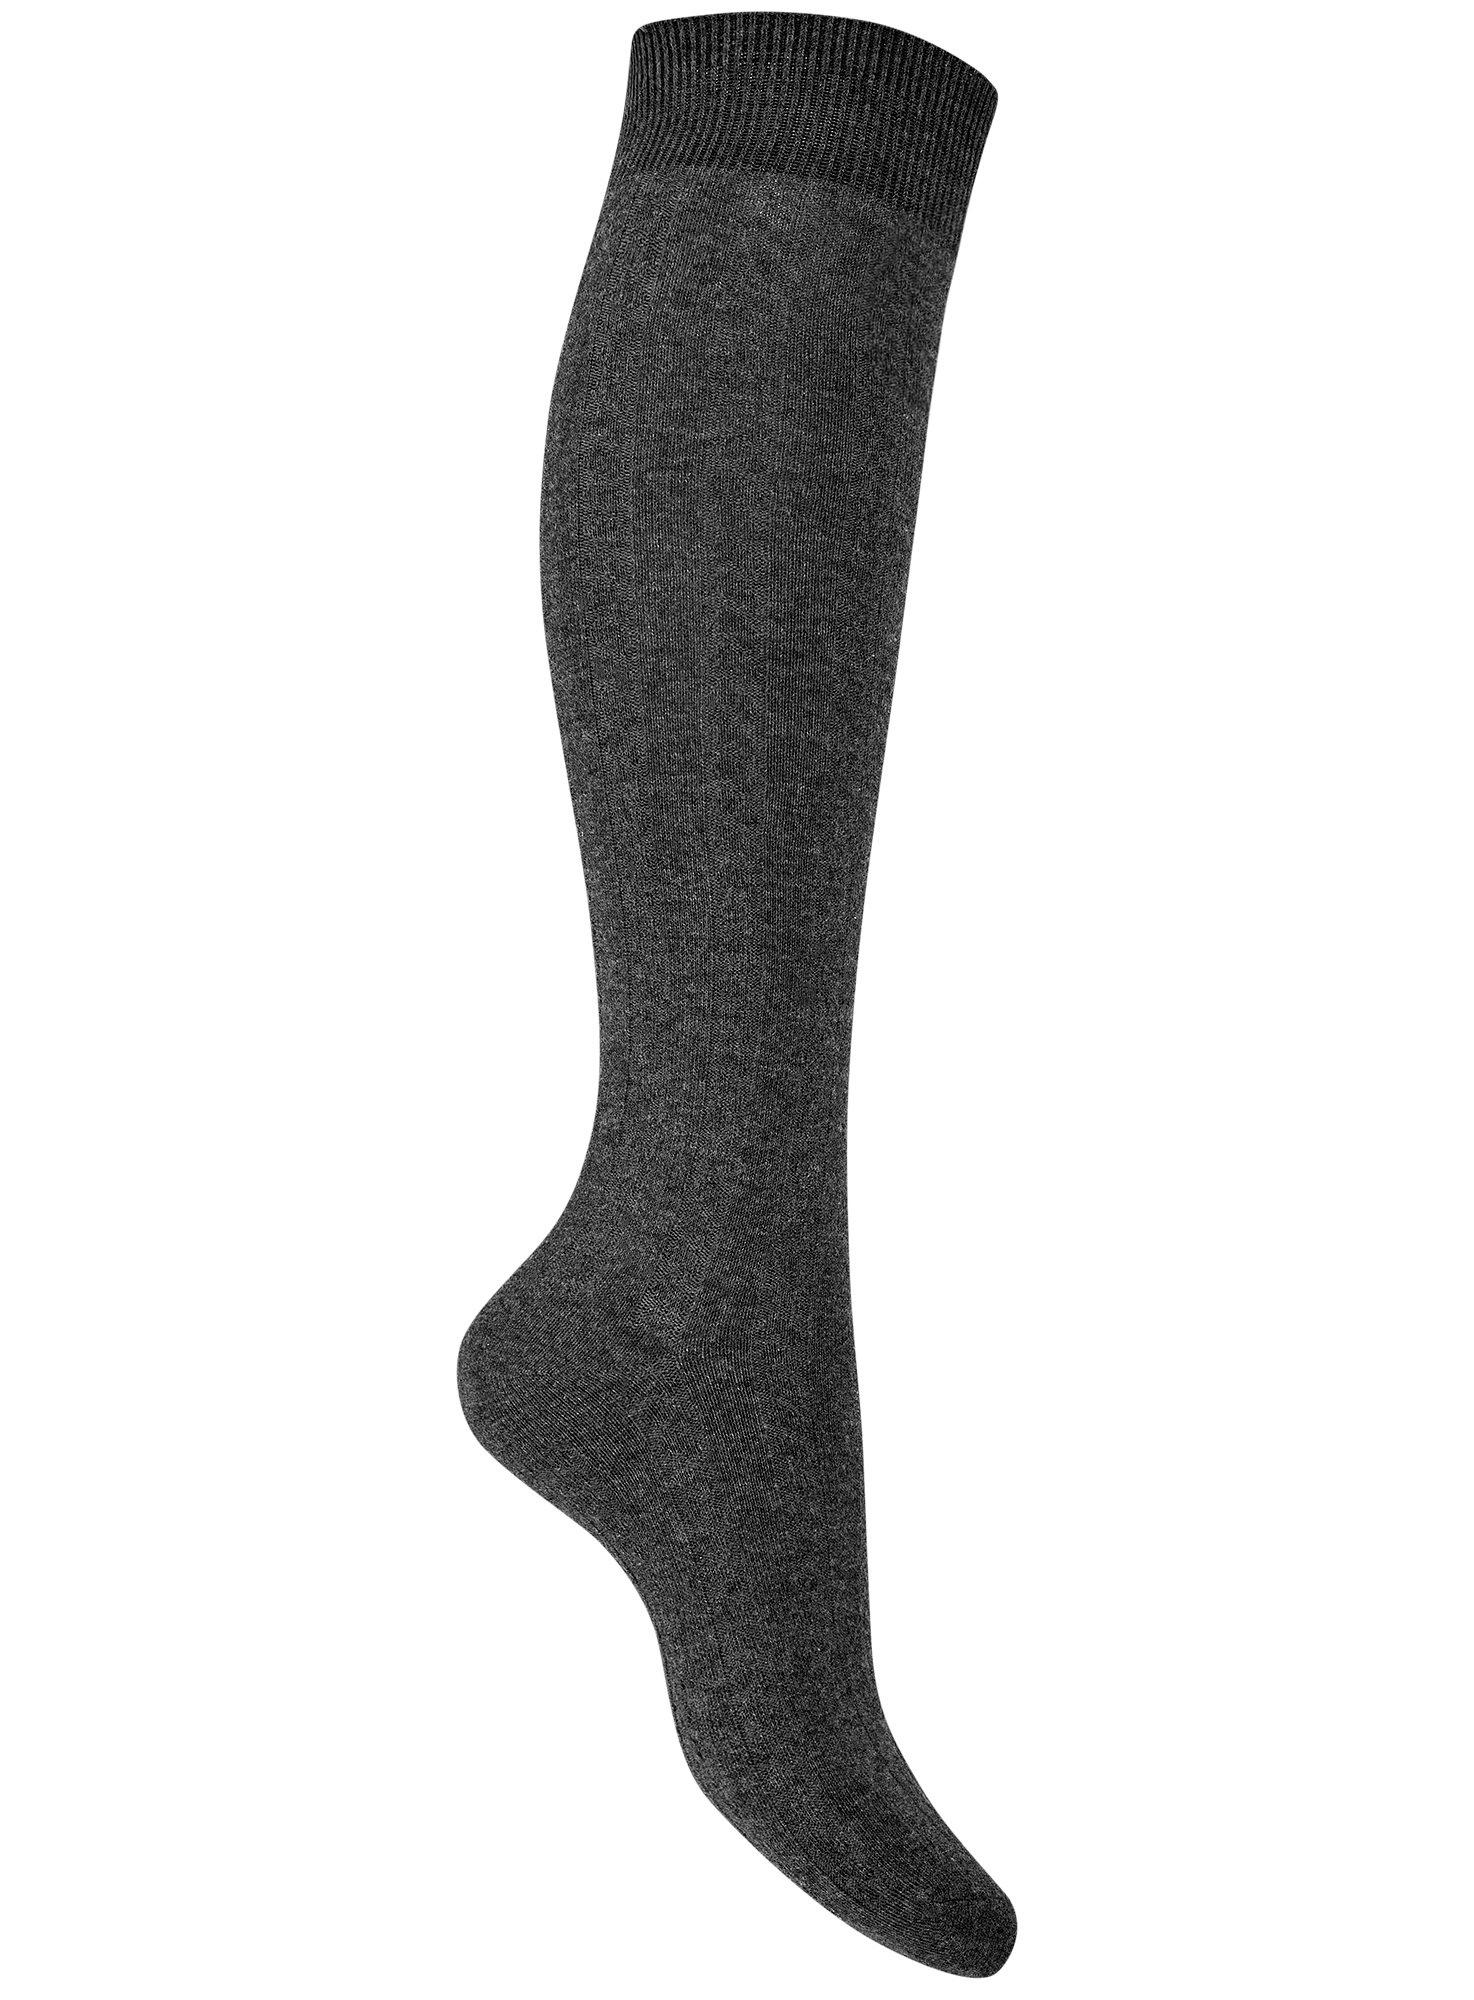 Гольфы с узором oodji для женщины (серый), 57104300-3/14608/2500M